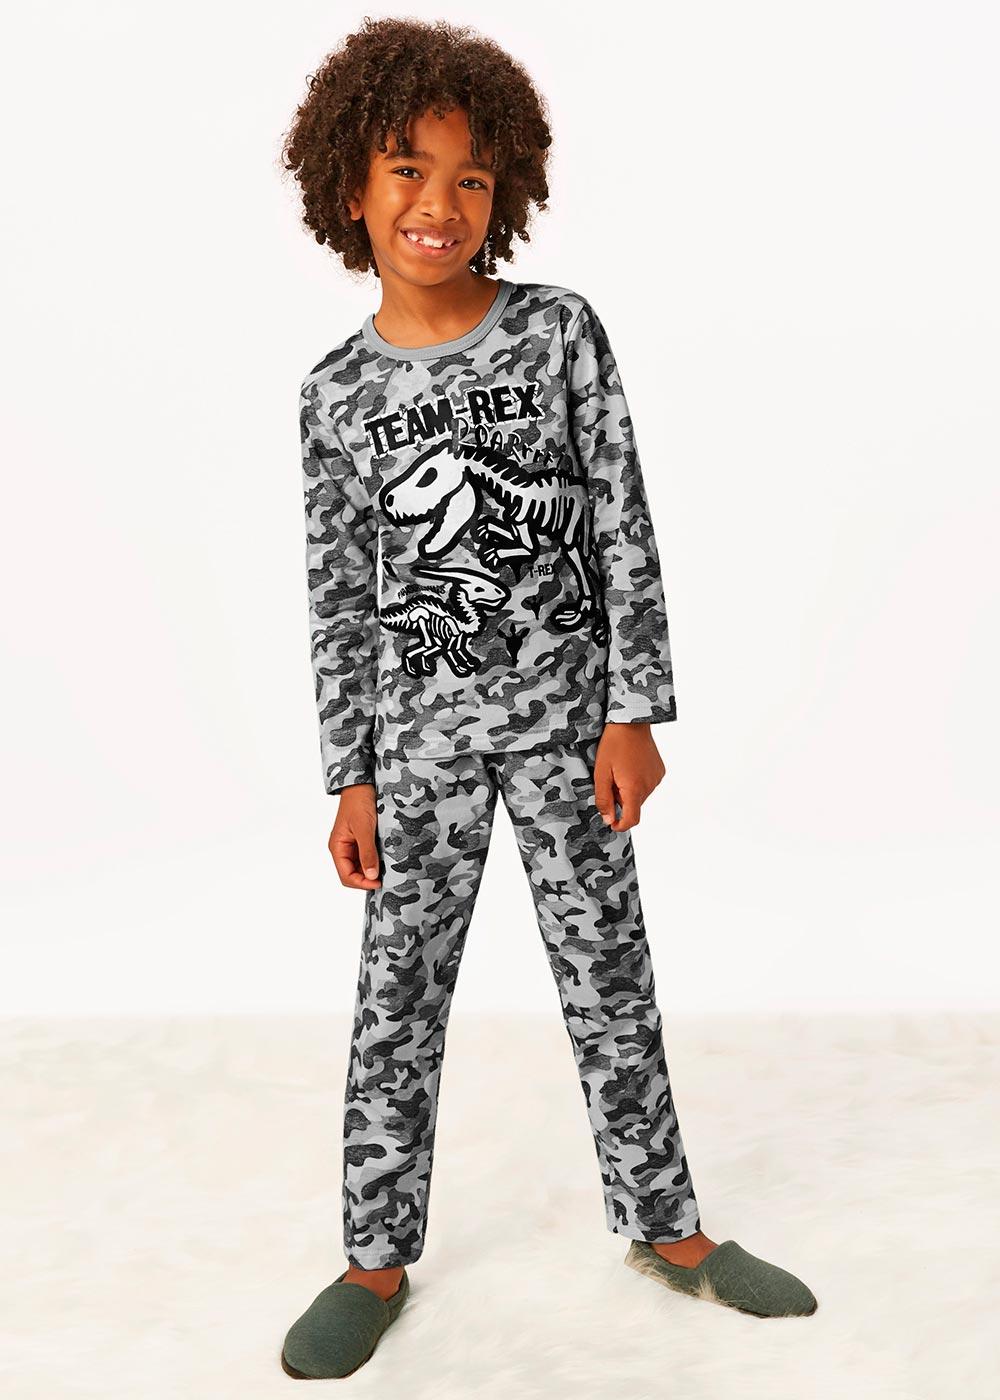 Pijama Infantil Masculino Inverno Cinza Team Rex - Malwee